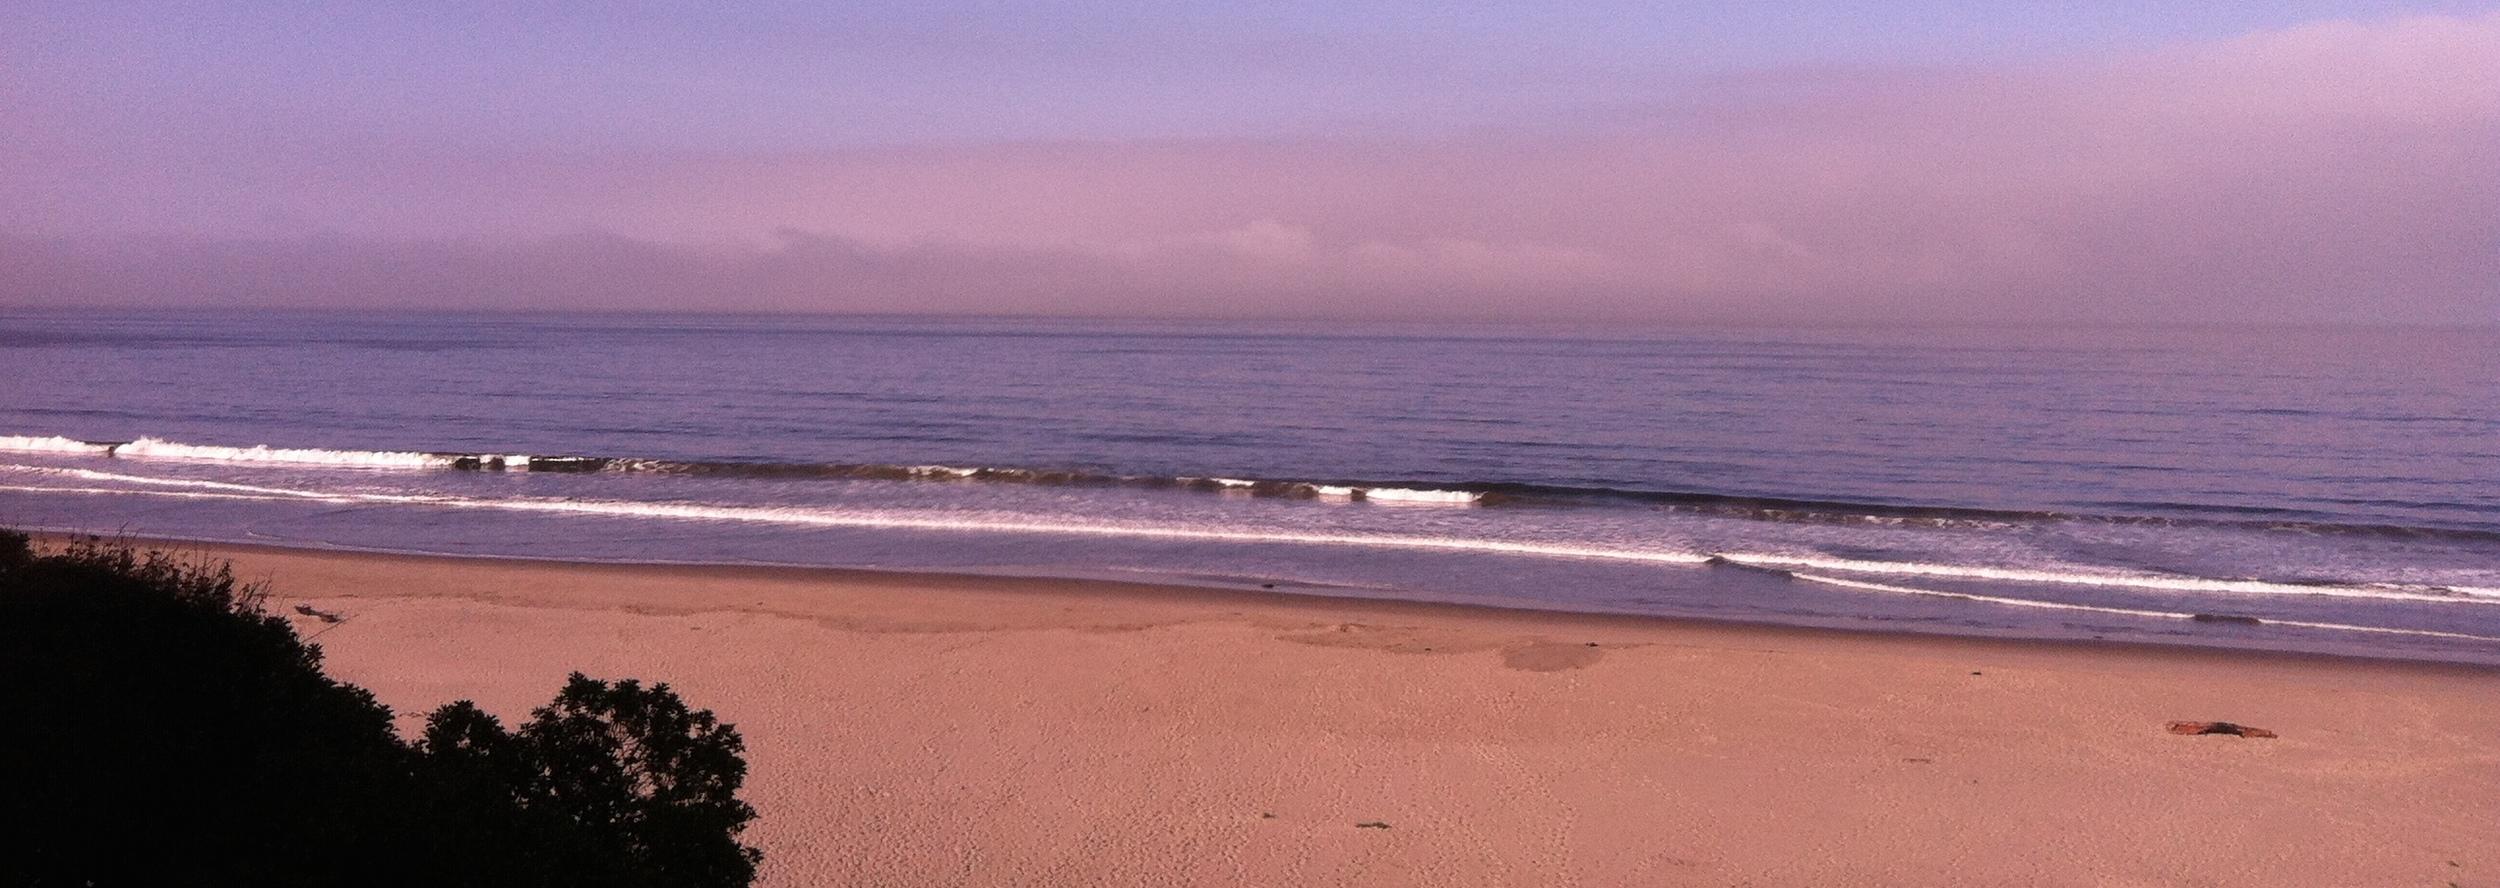 CAMPUS LAUNDRY - LA SELVA BEACH